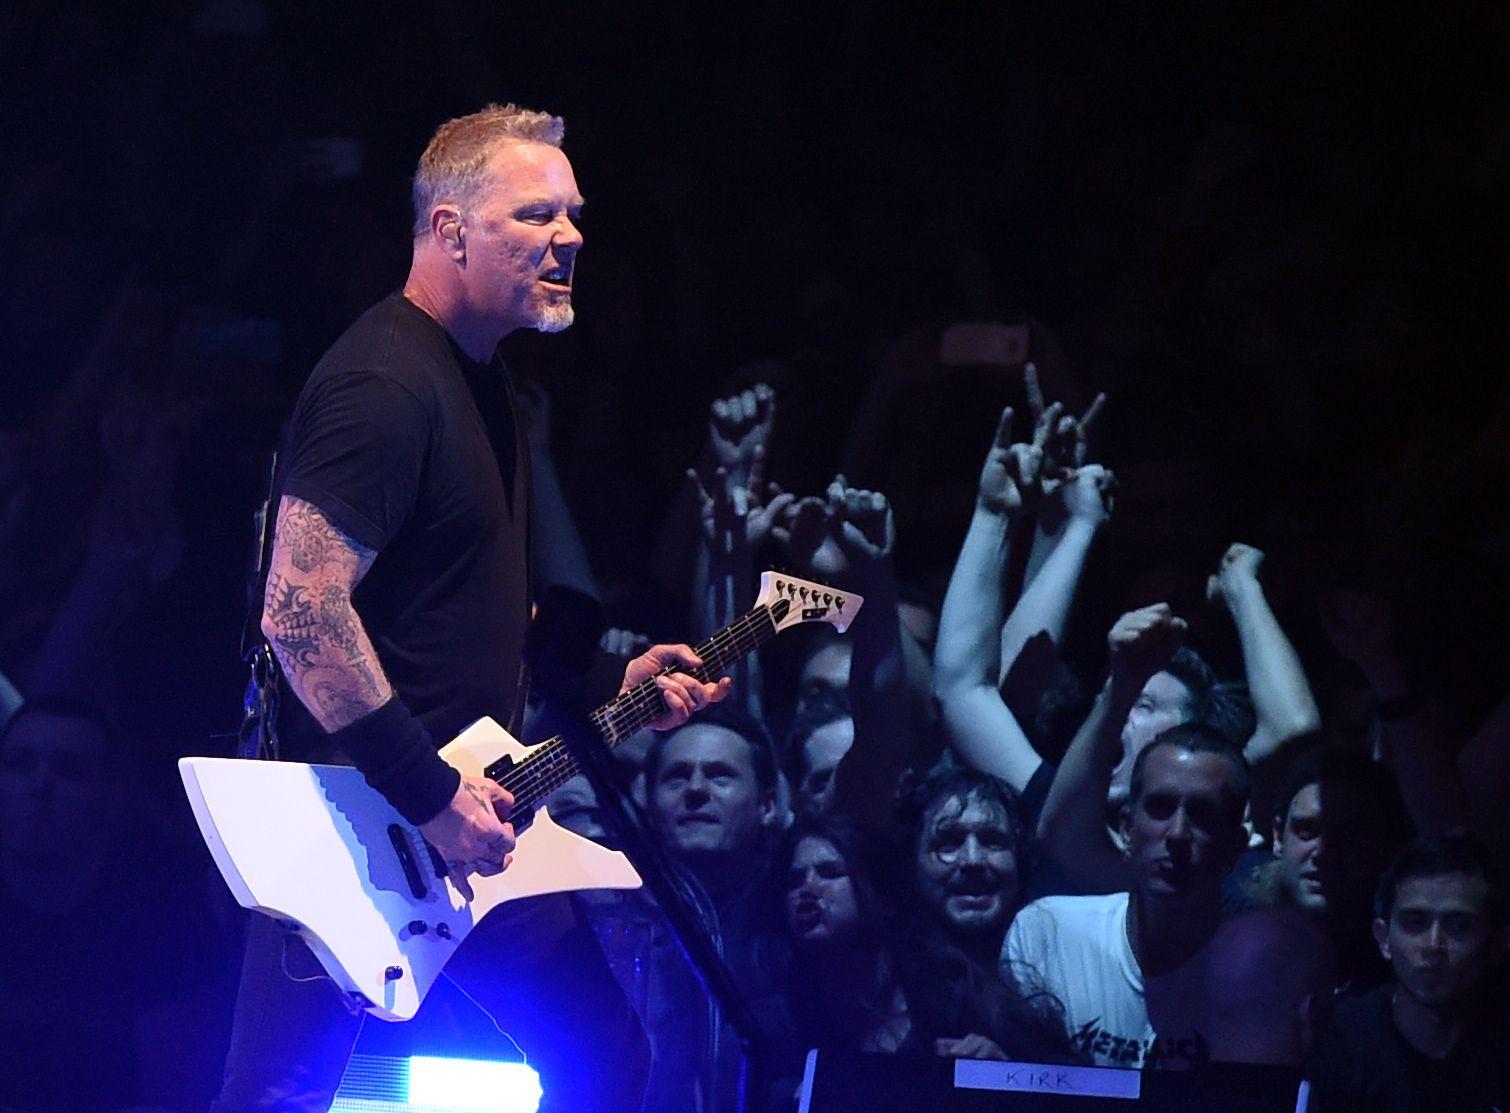 Metallica rockt 2019 das Ernst-Happel-Stadion in Wien